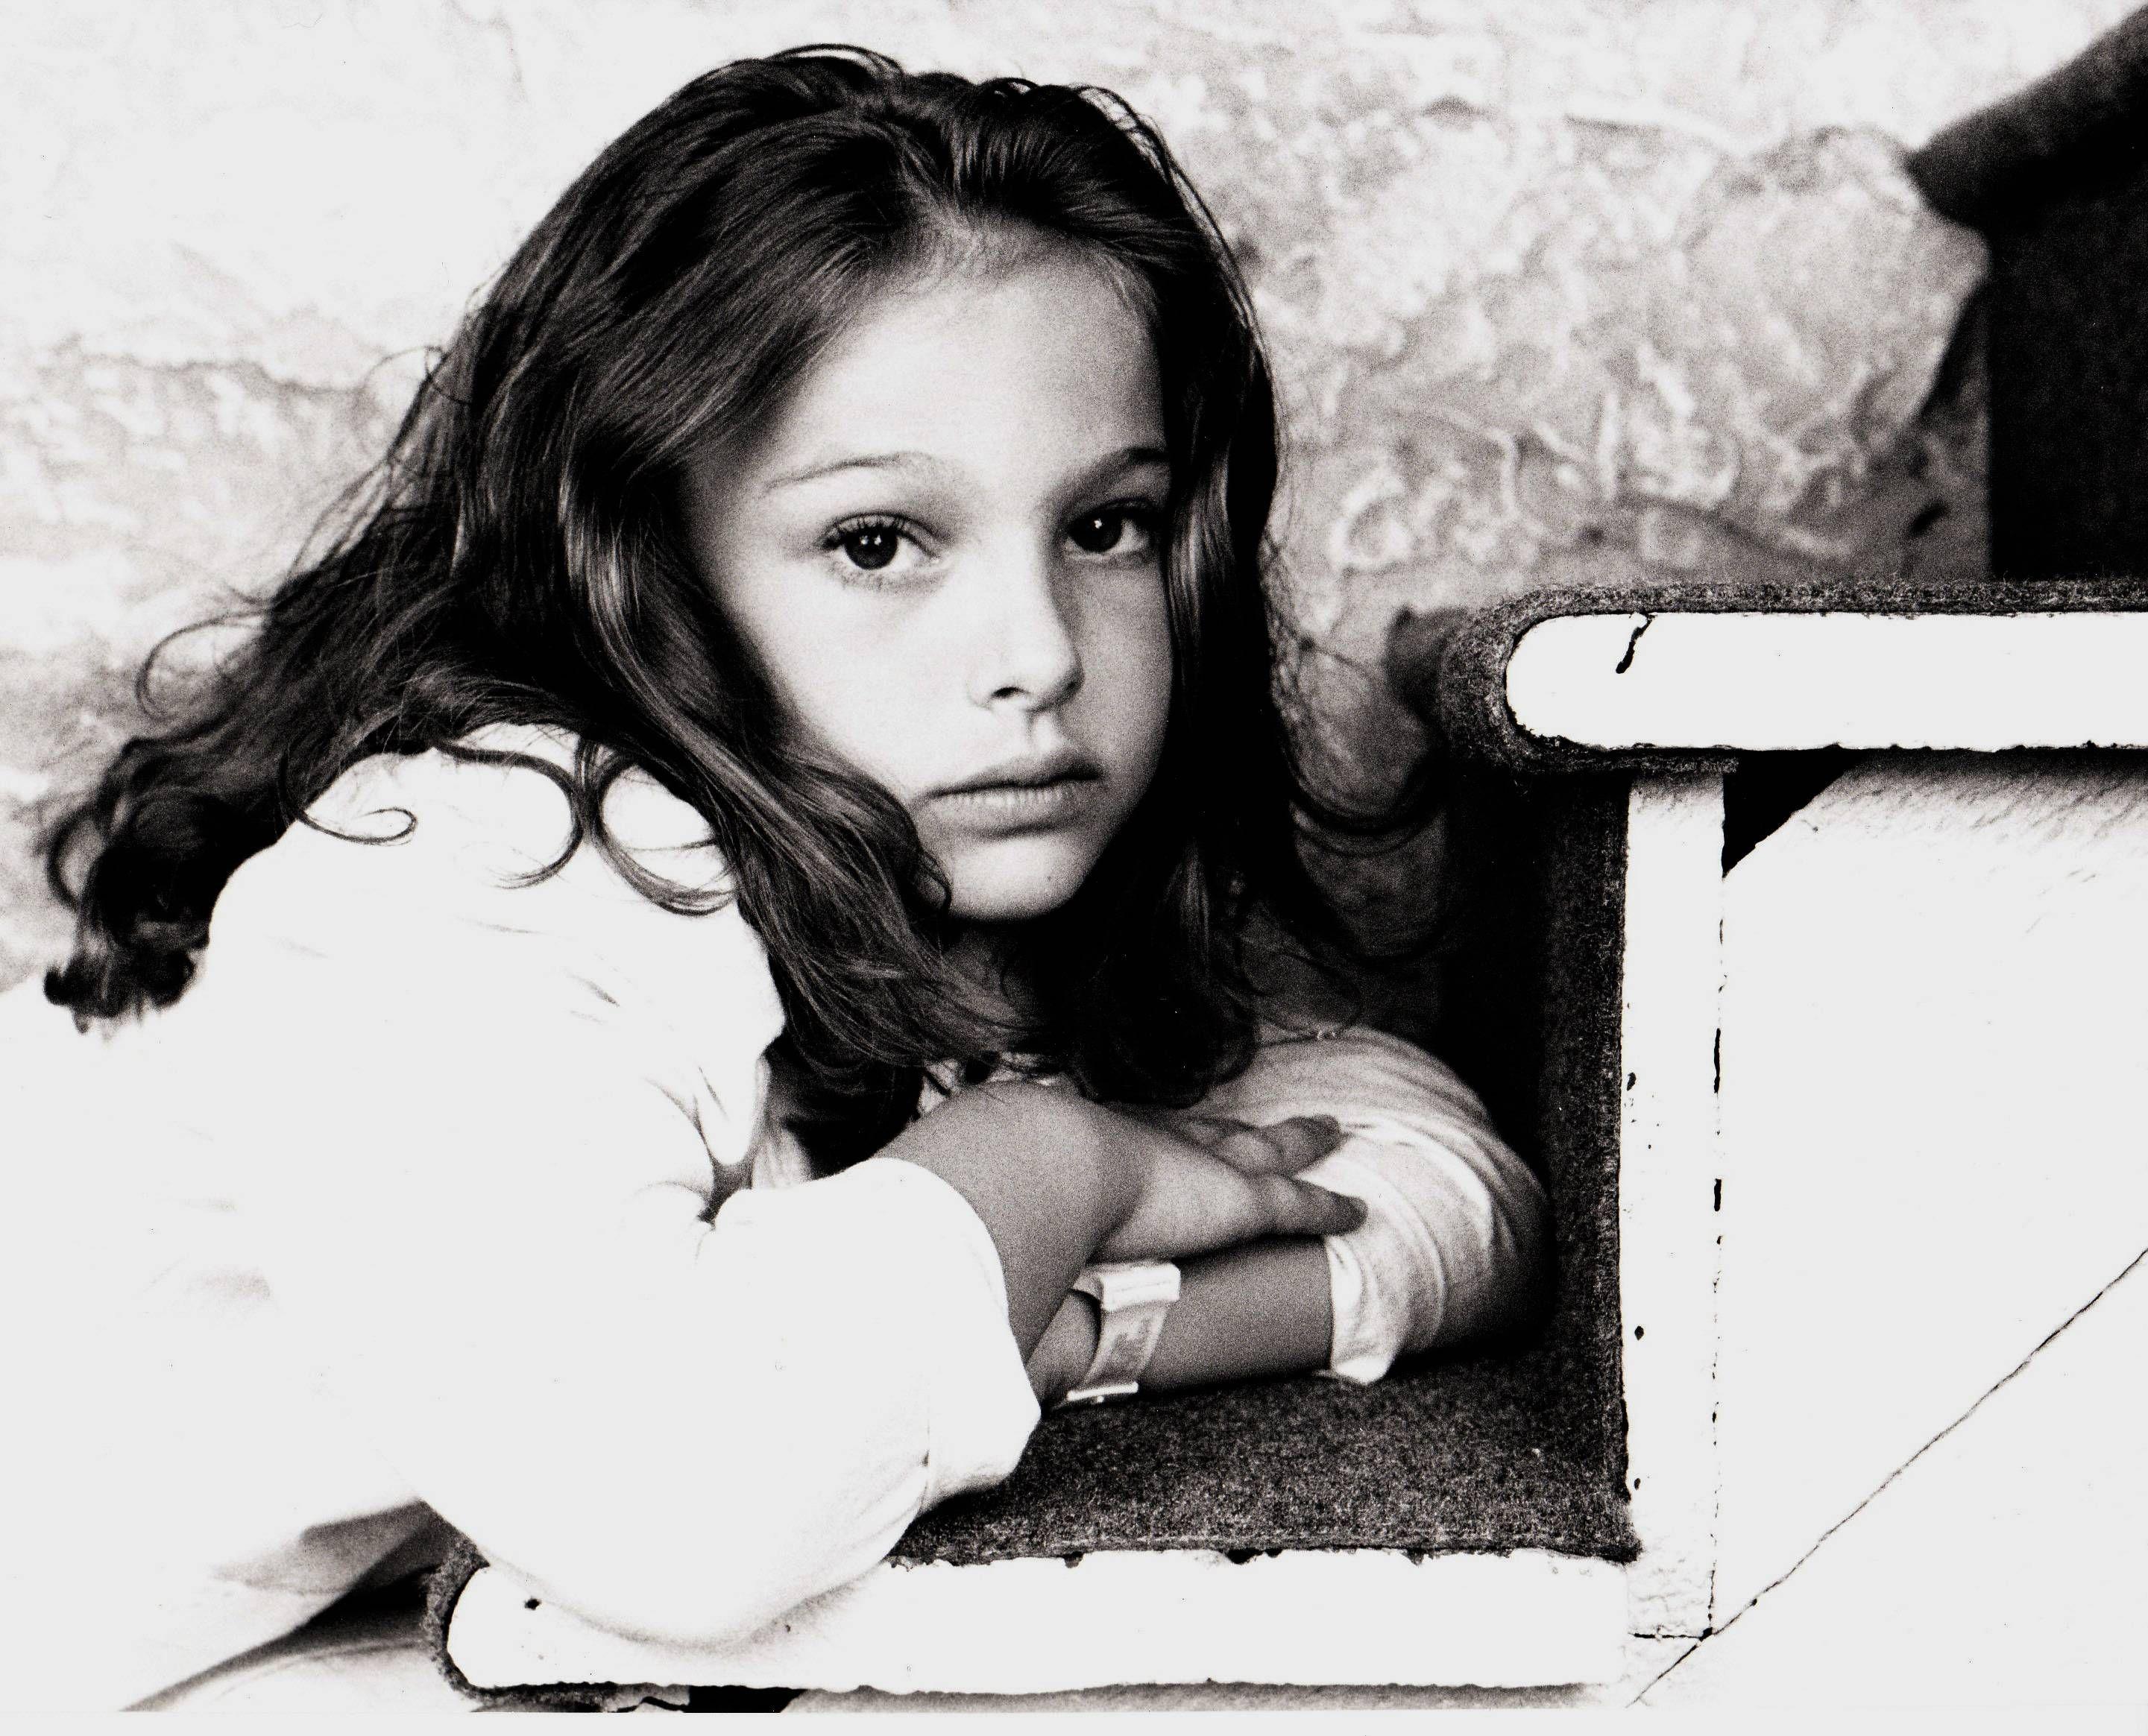 Natalie Portman cute pics, Natalie Portman Beautiful pics, Natalie Portman childhood pics, Natalie Portman child pics,